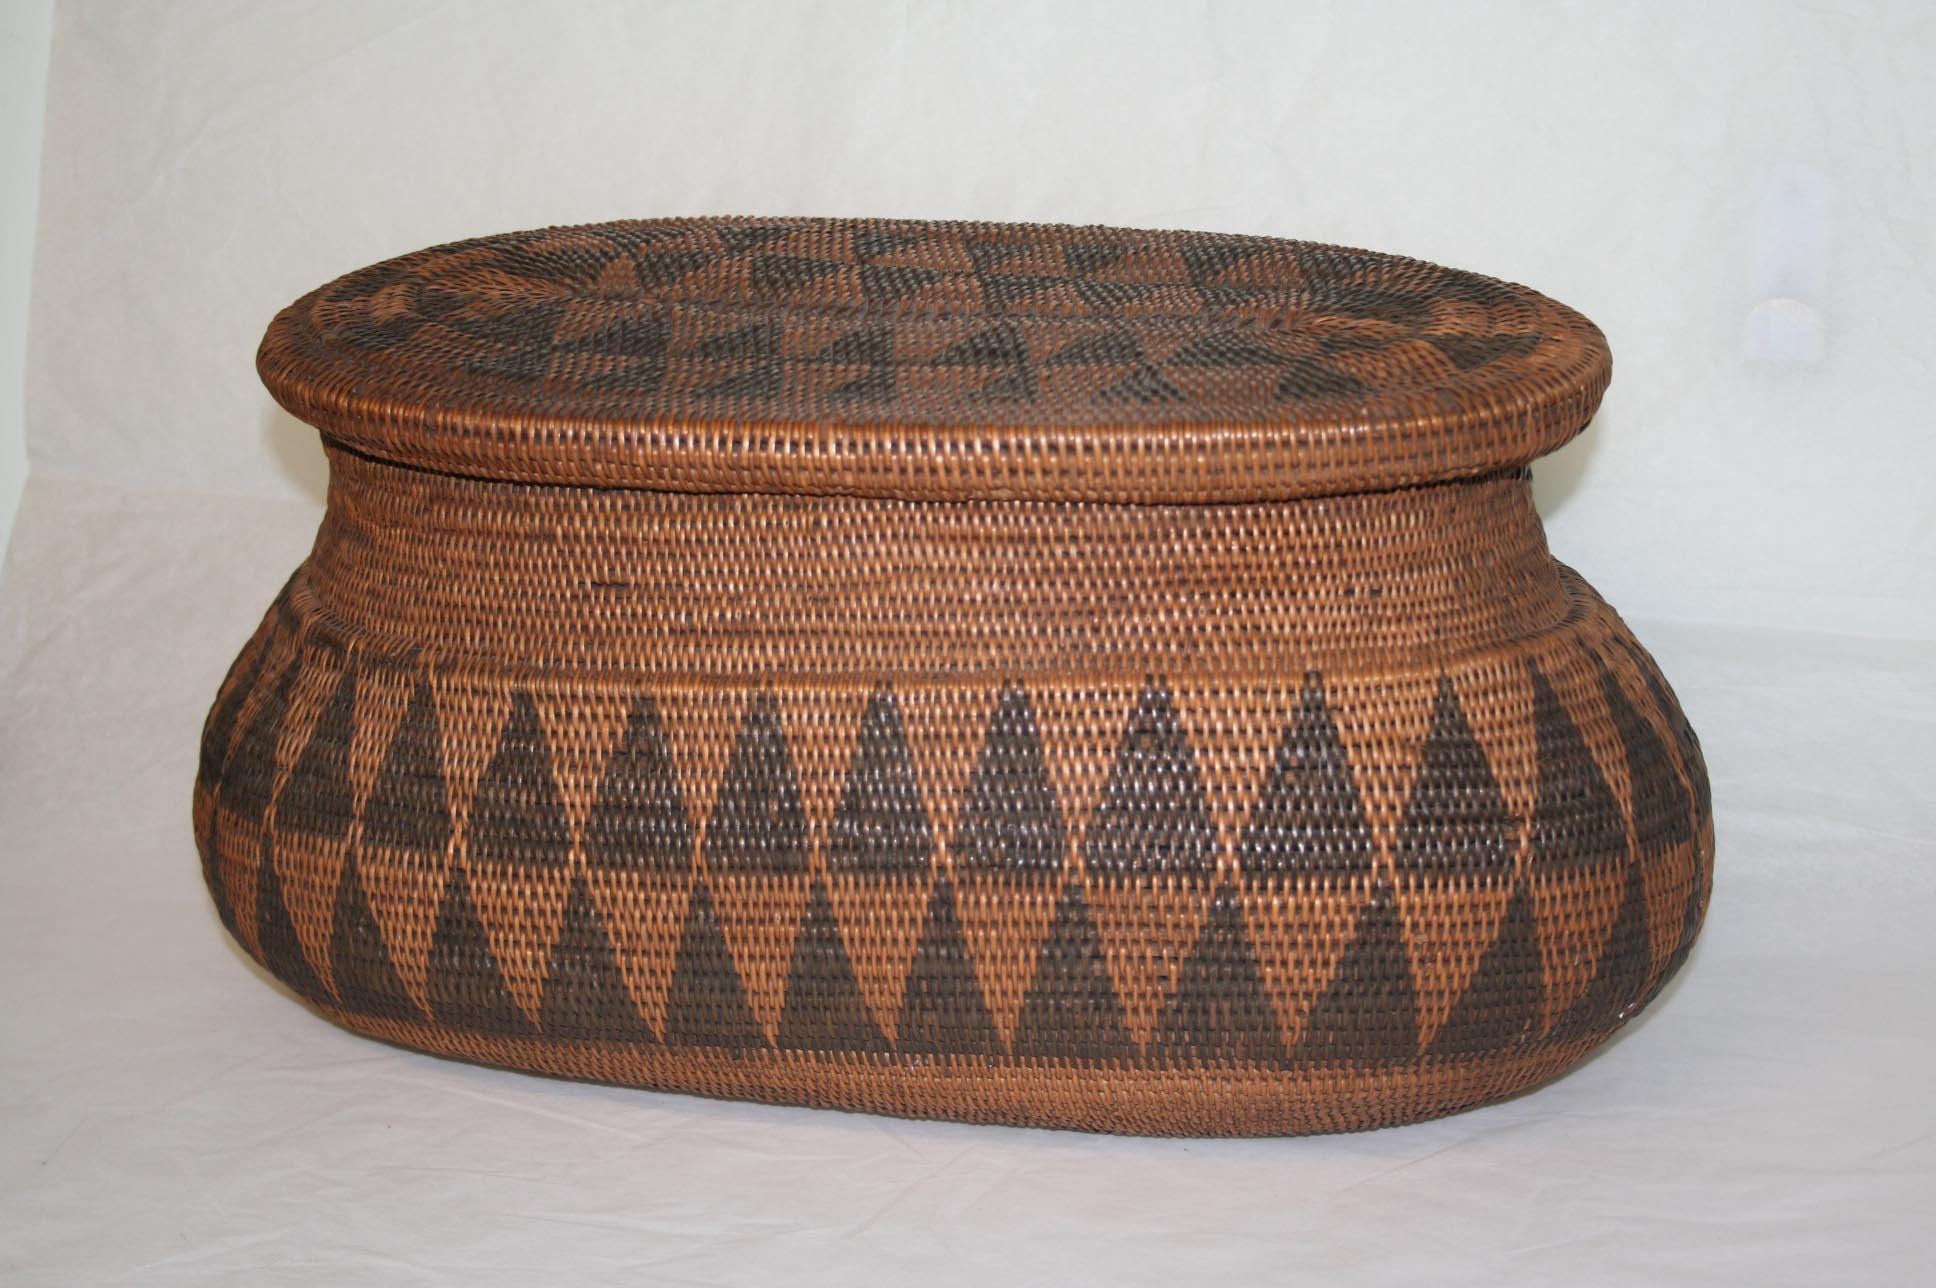 A woven Mapokwe basket